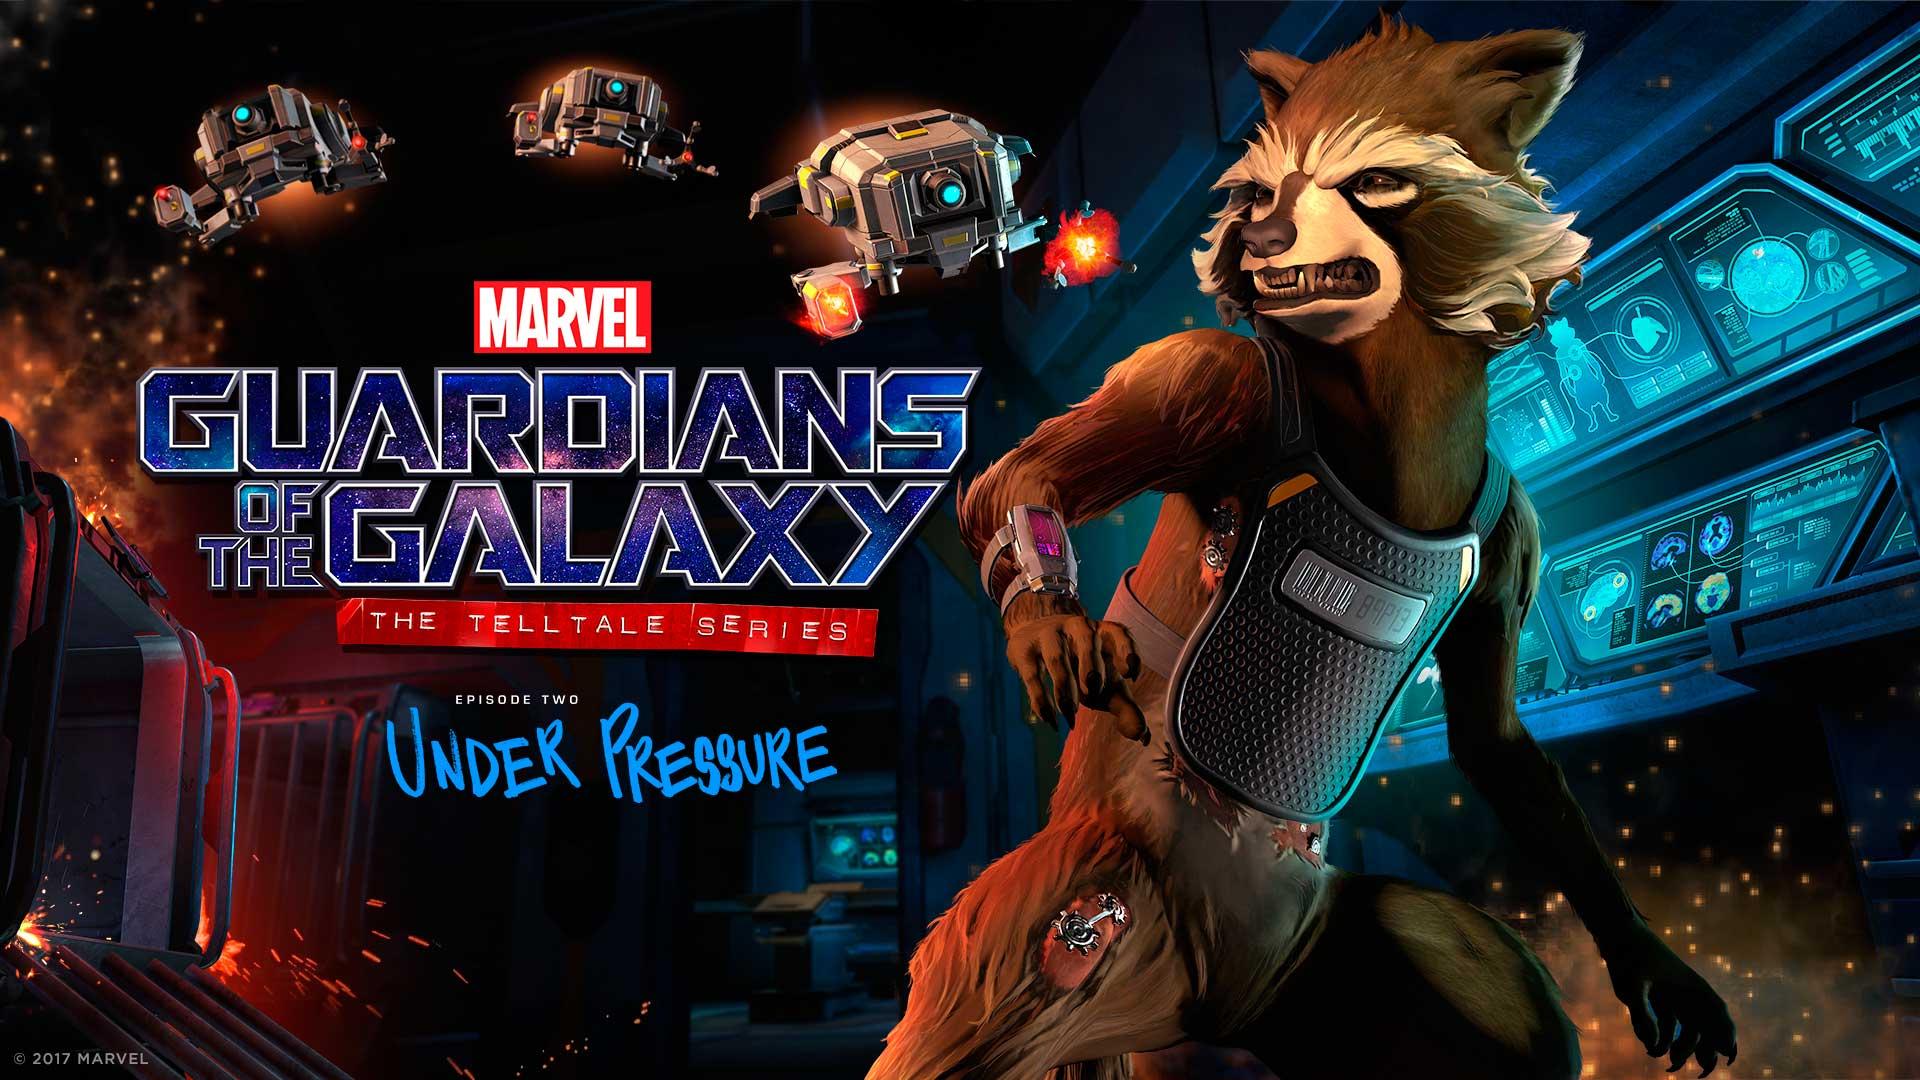 segundo episodio de Guardians of the Galaxy: The Telltale Series